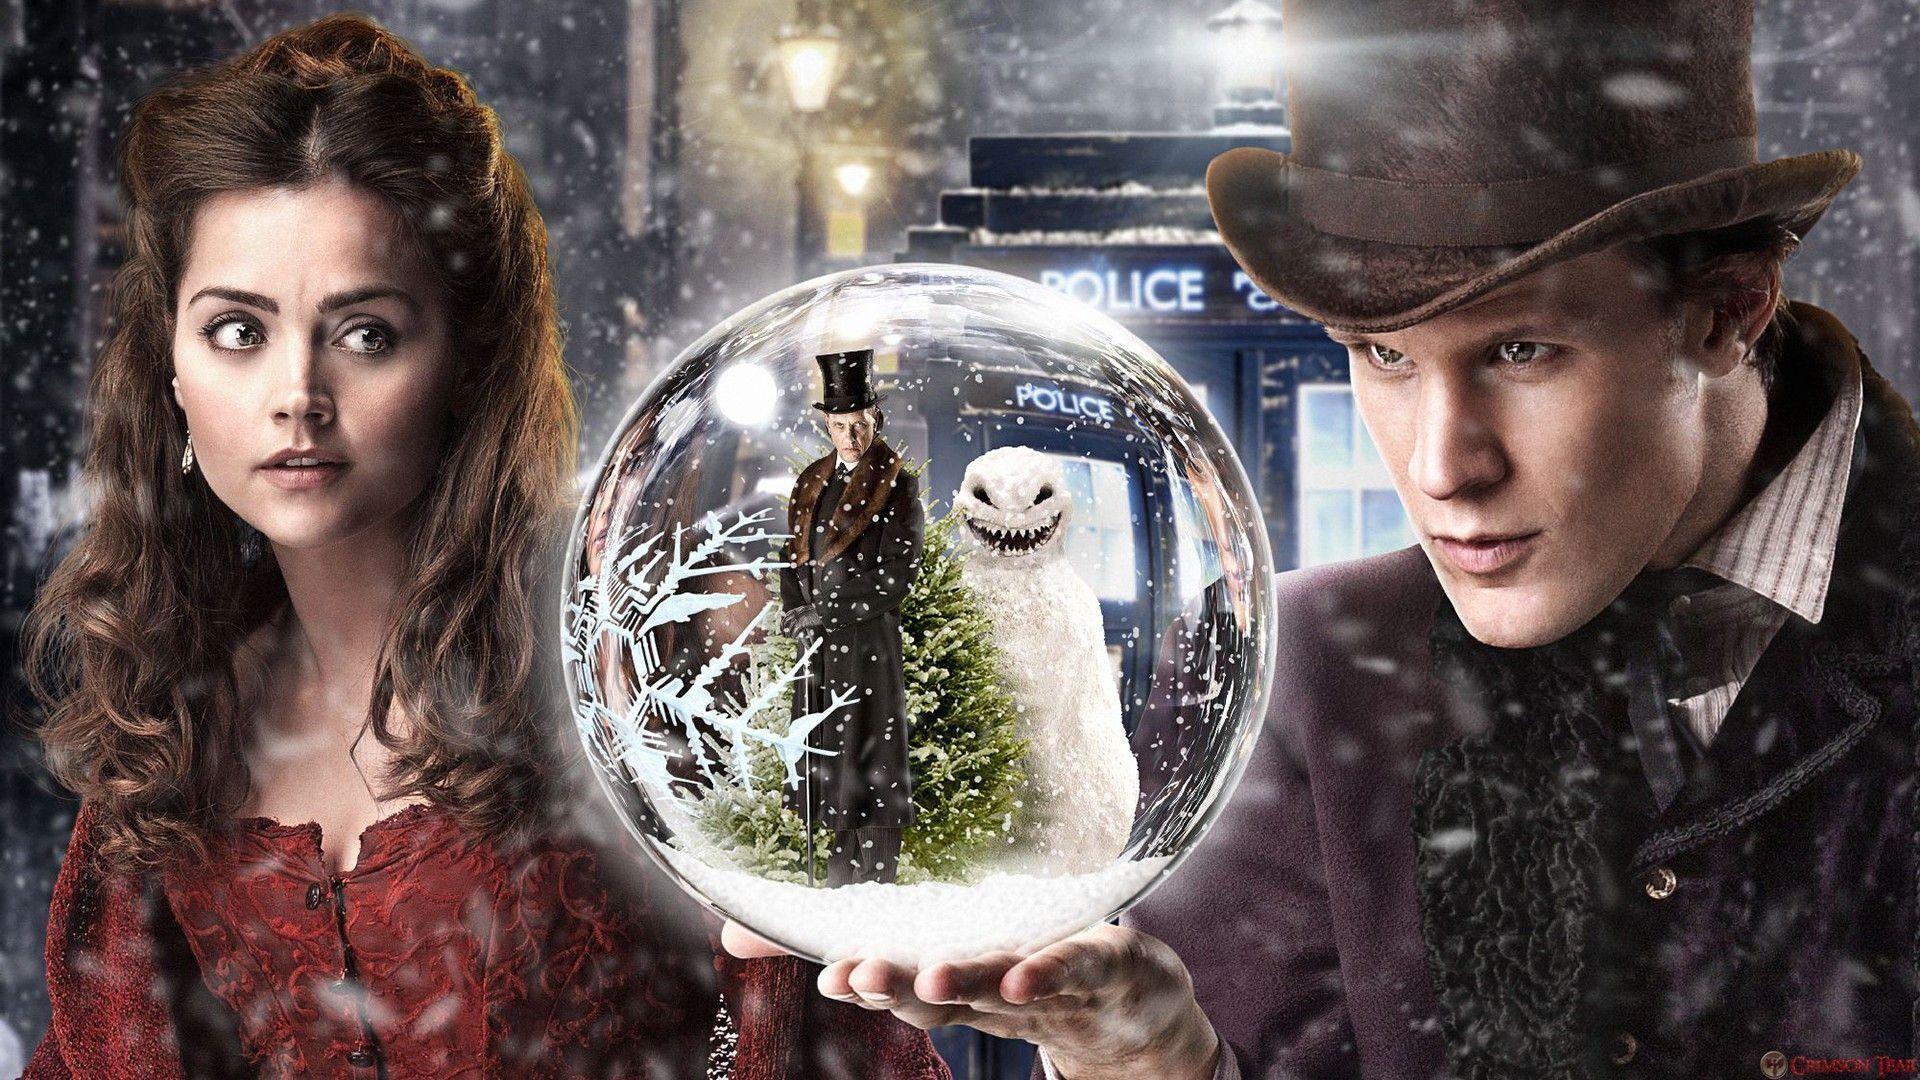 Doctor Who Matt Smith Wallpaper 62 Images